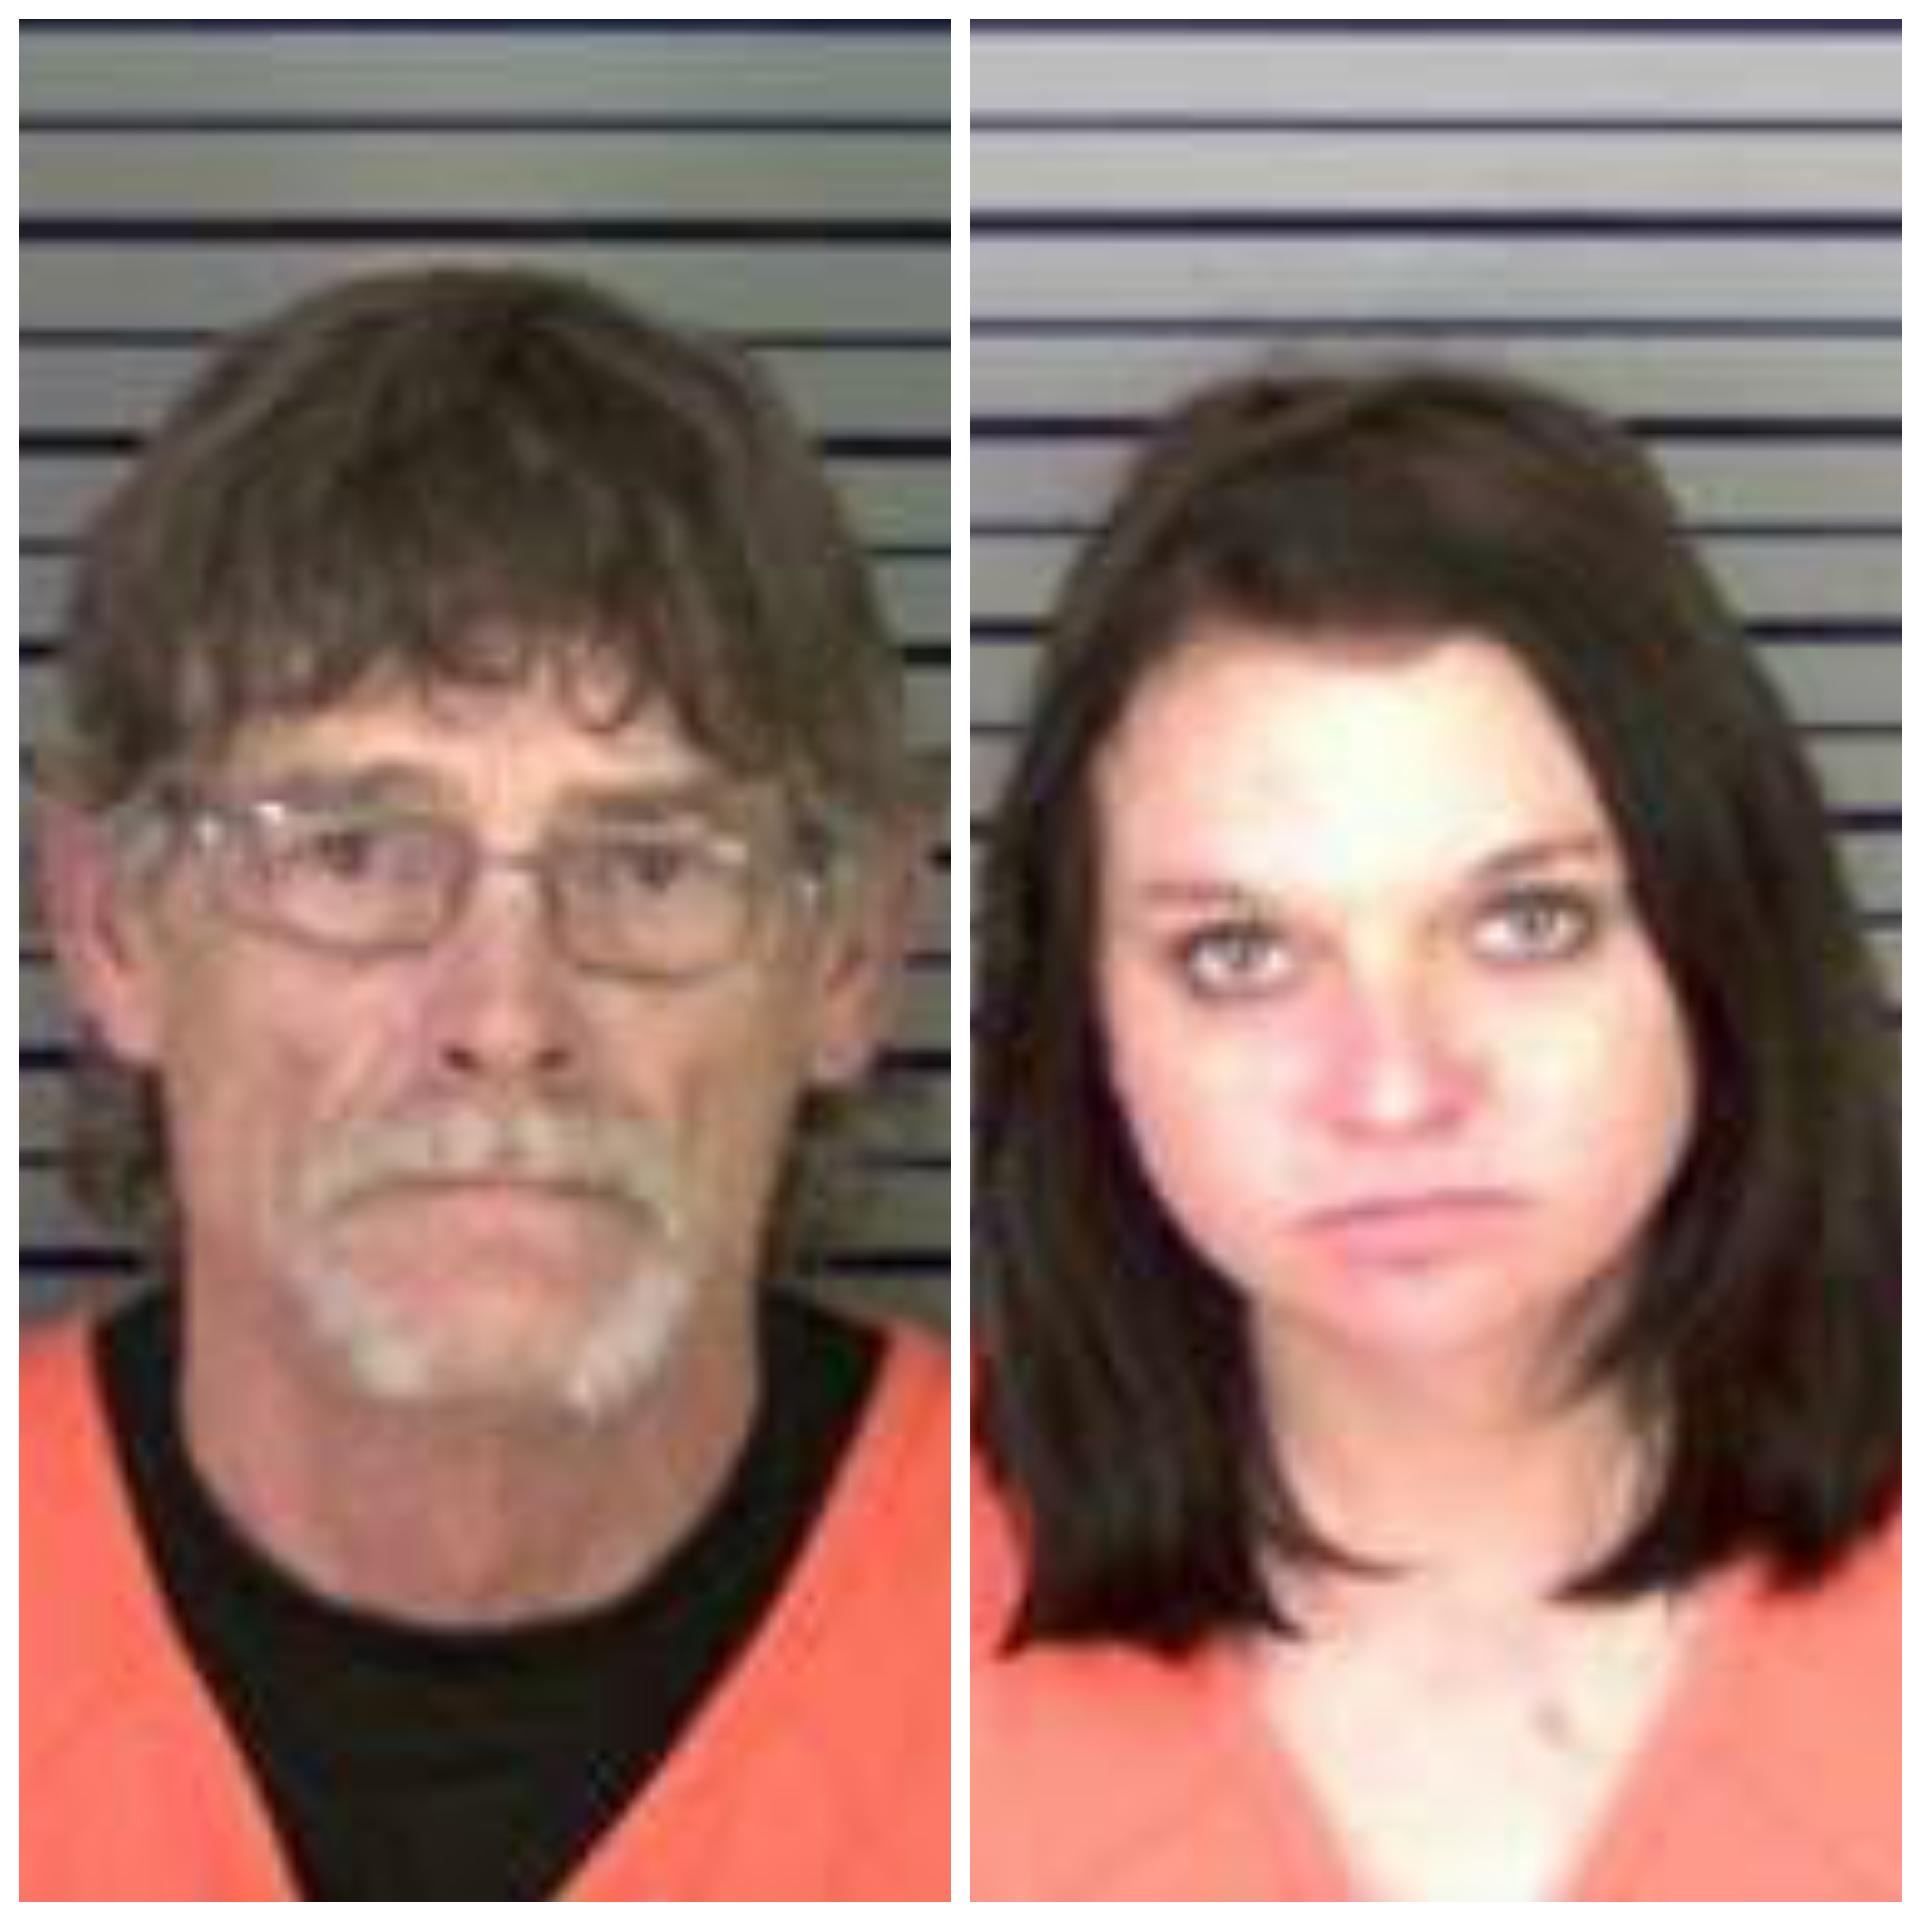 $25,000 reward offered for info leading to arrest of Trussville bank robber